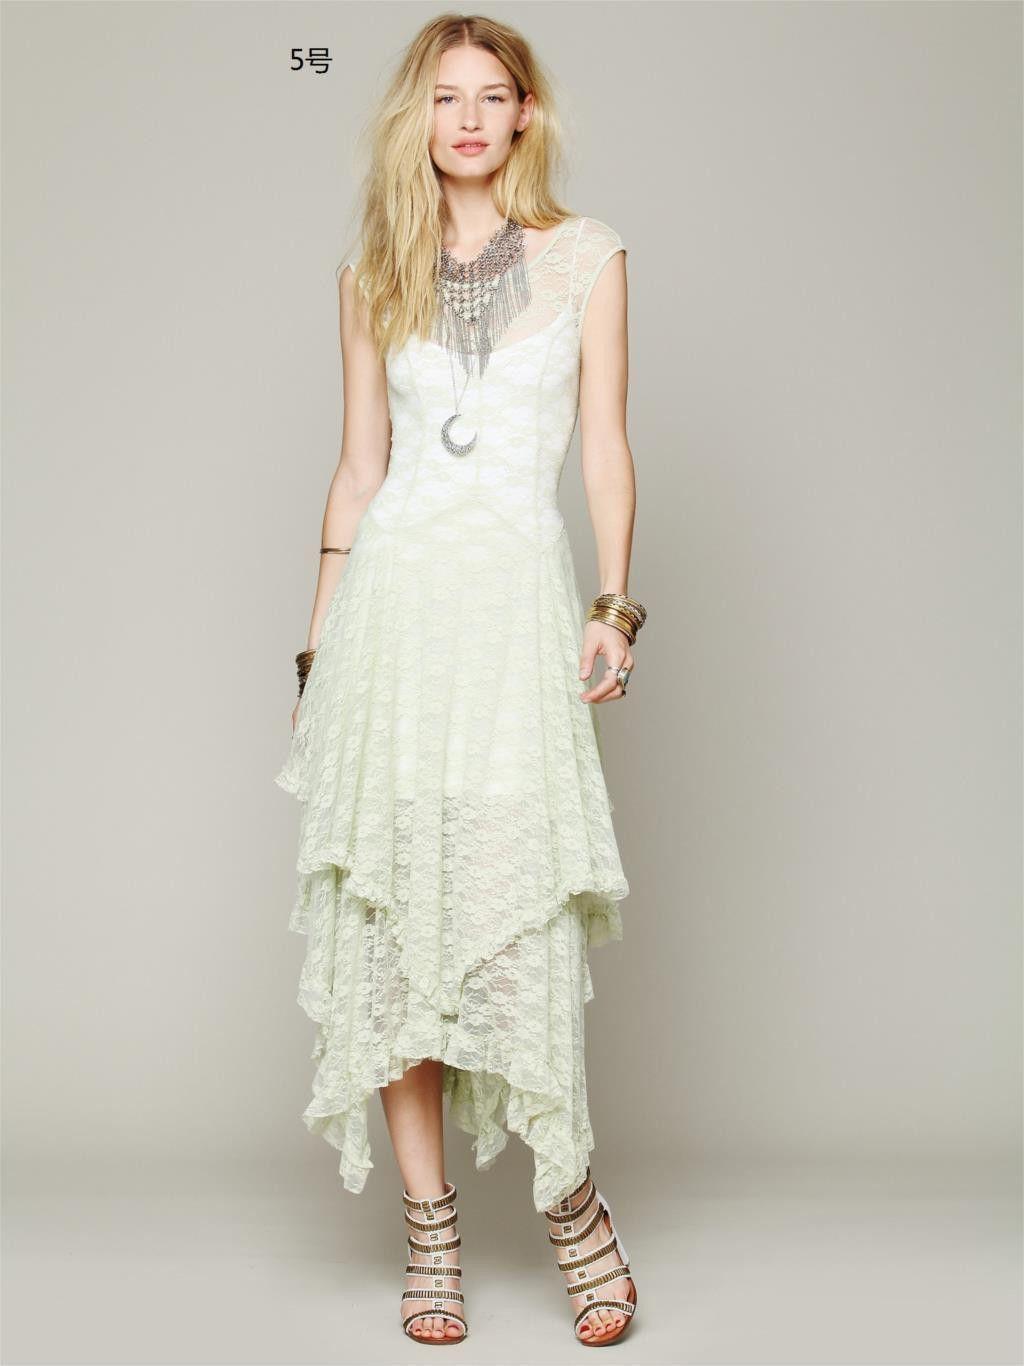 Boho Chic Bohemian Fashion hippie Style Asymmetrical Embroidery ...